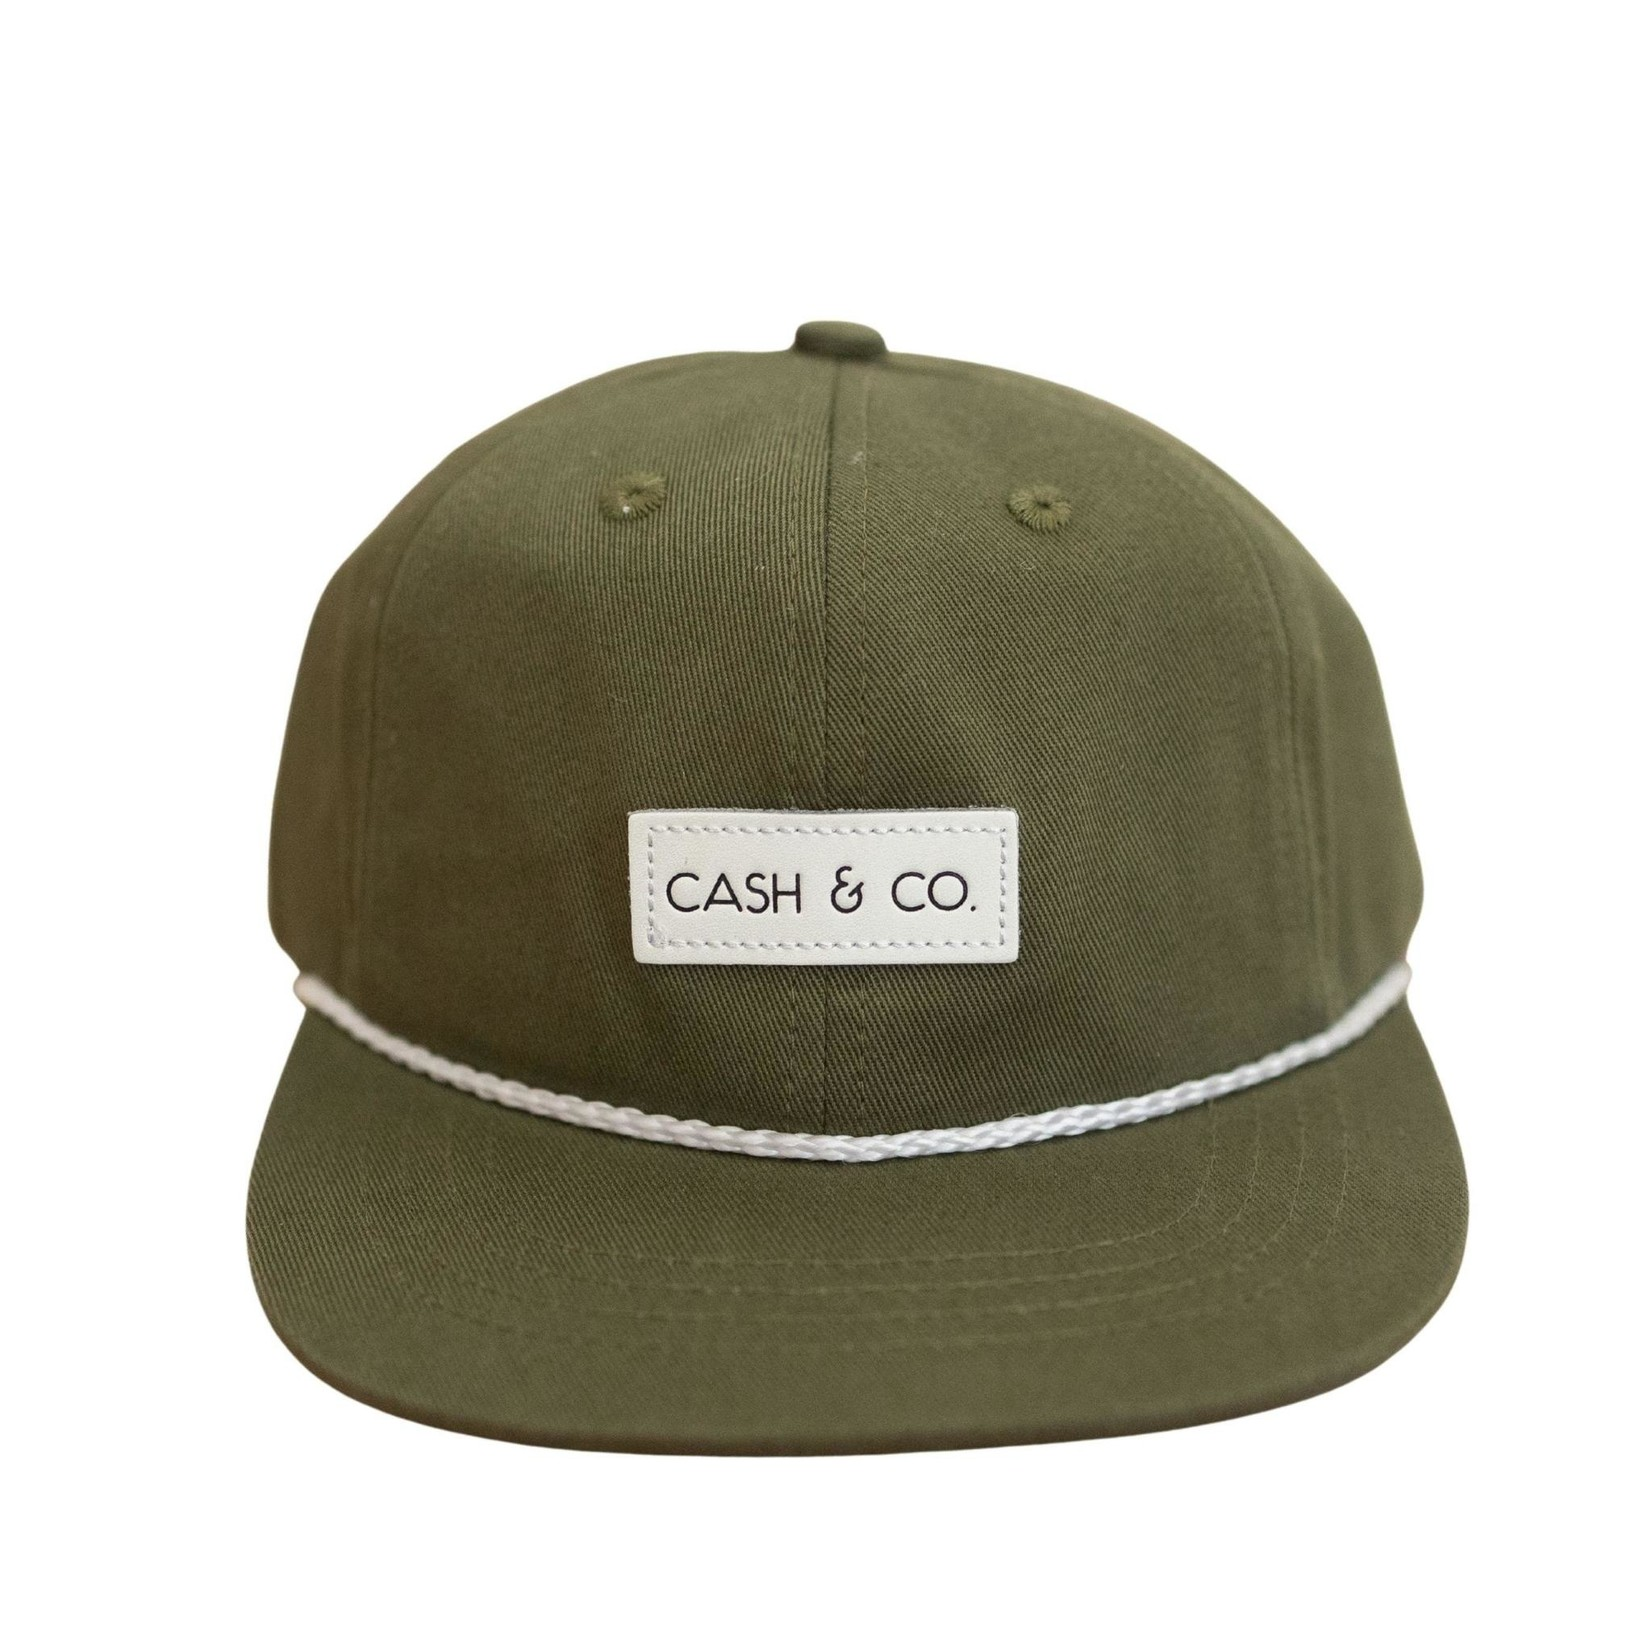 Cash & Co Big Green Hat